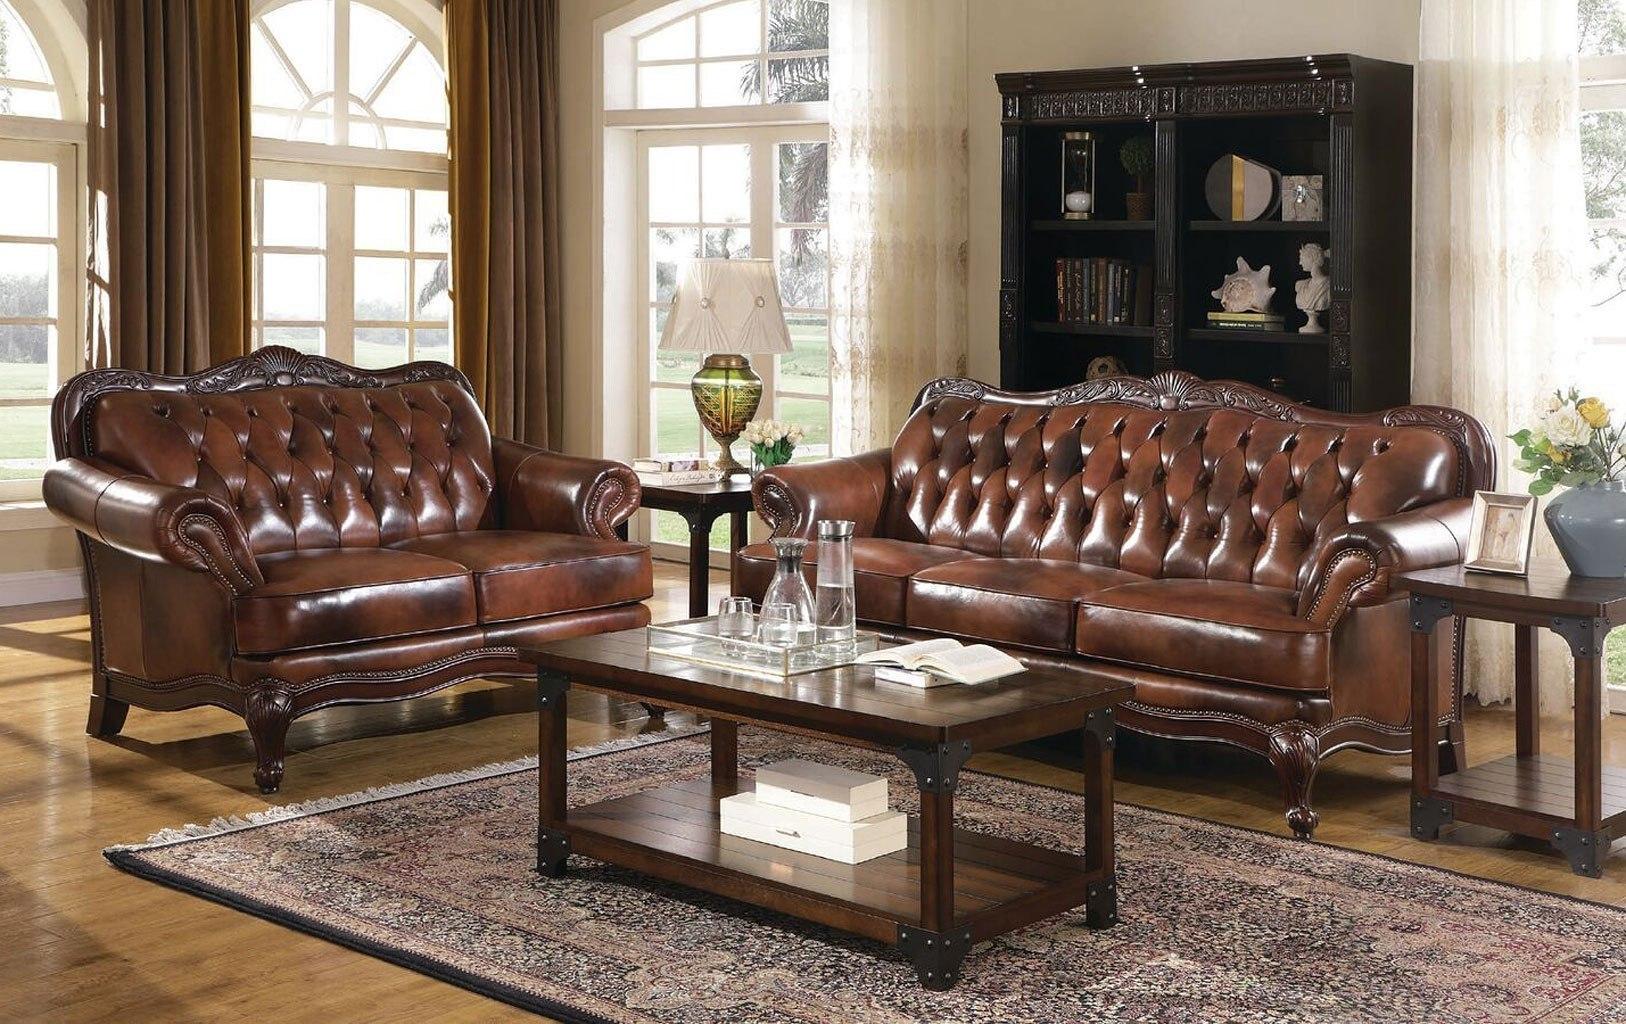 Victoria Leather Living Room Set Coaster Furniture 5